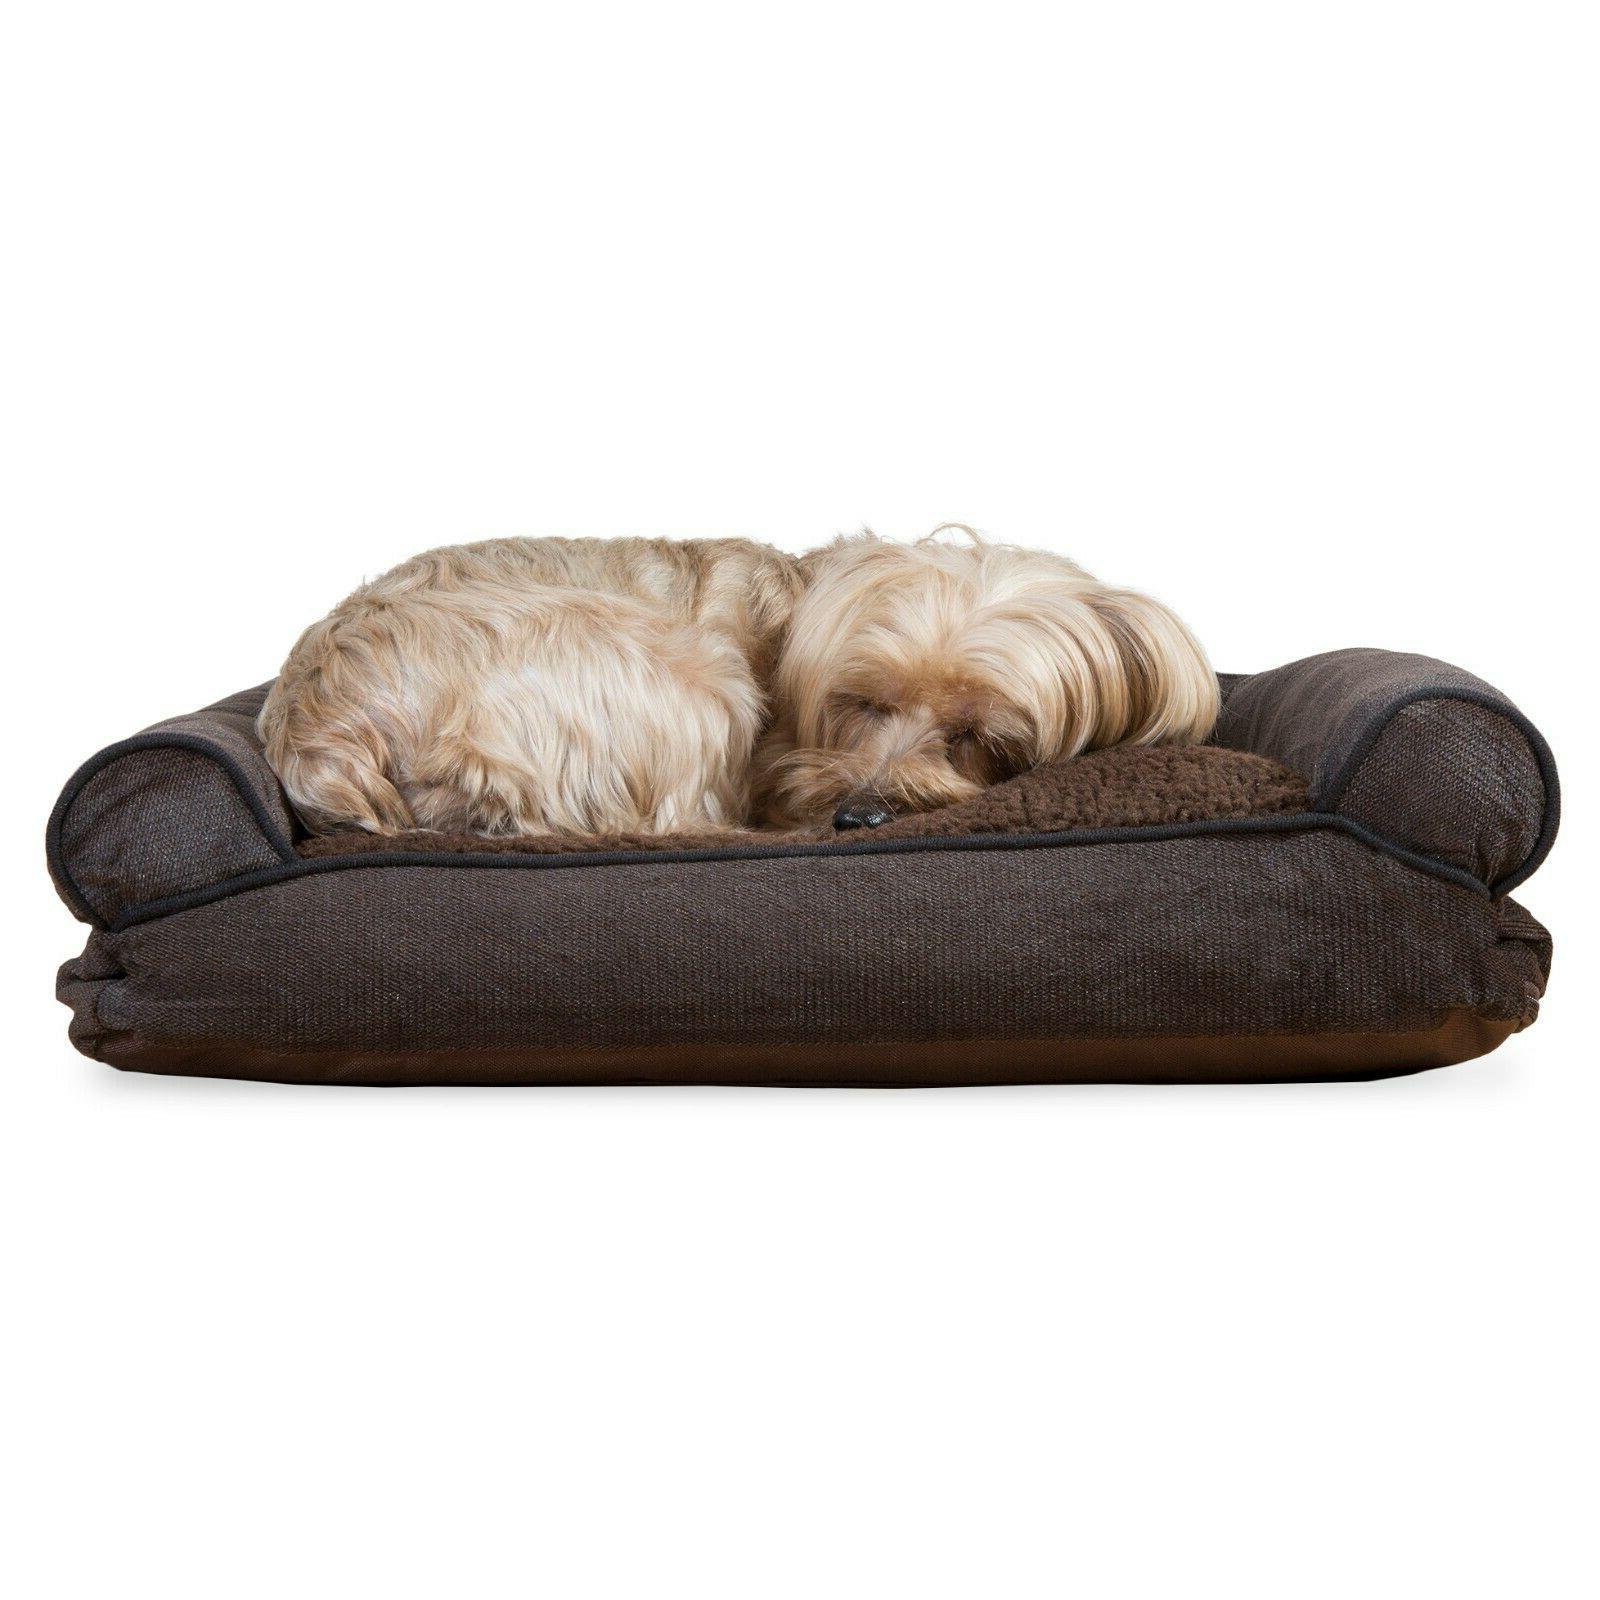 FurHaven & Pillow Sofa